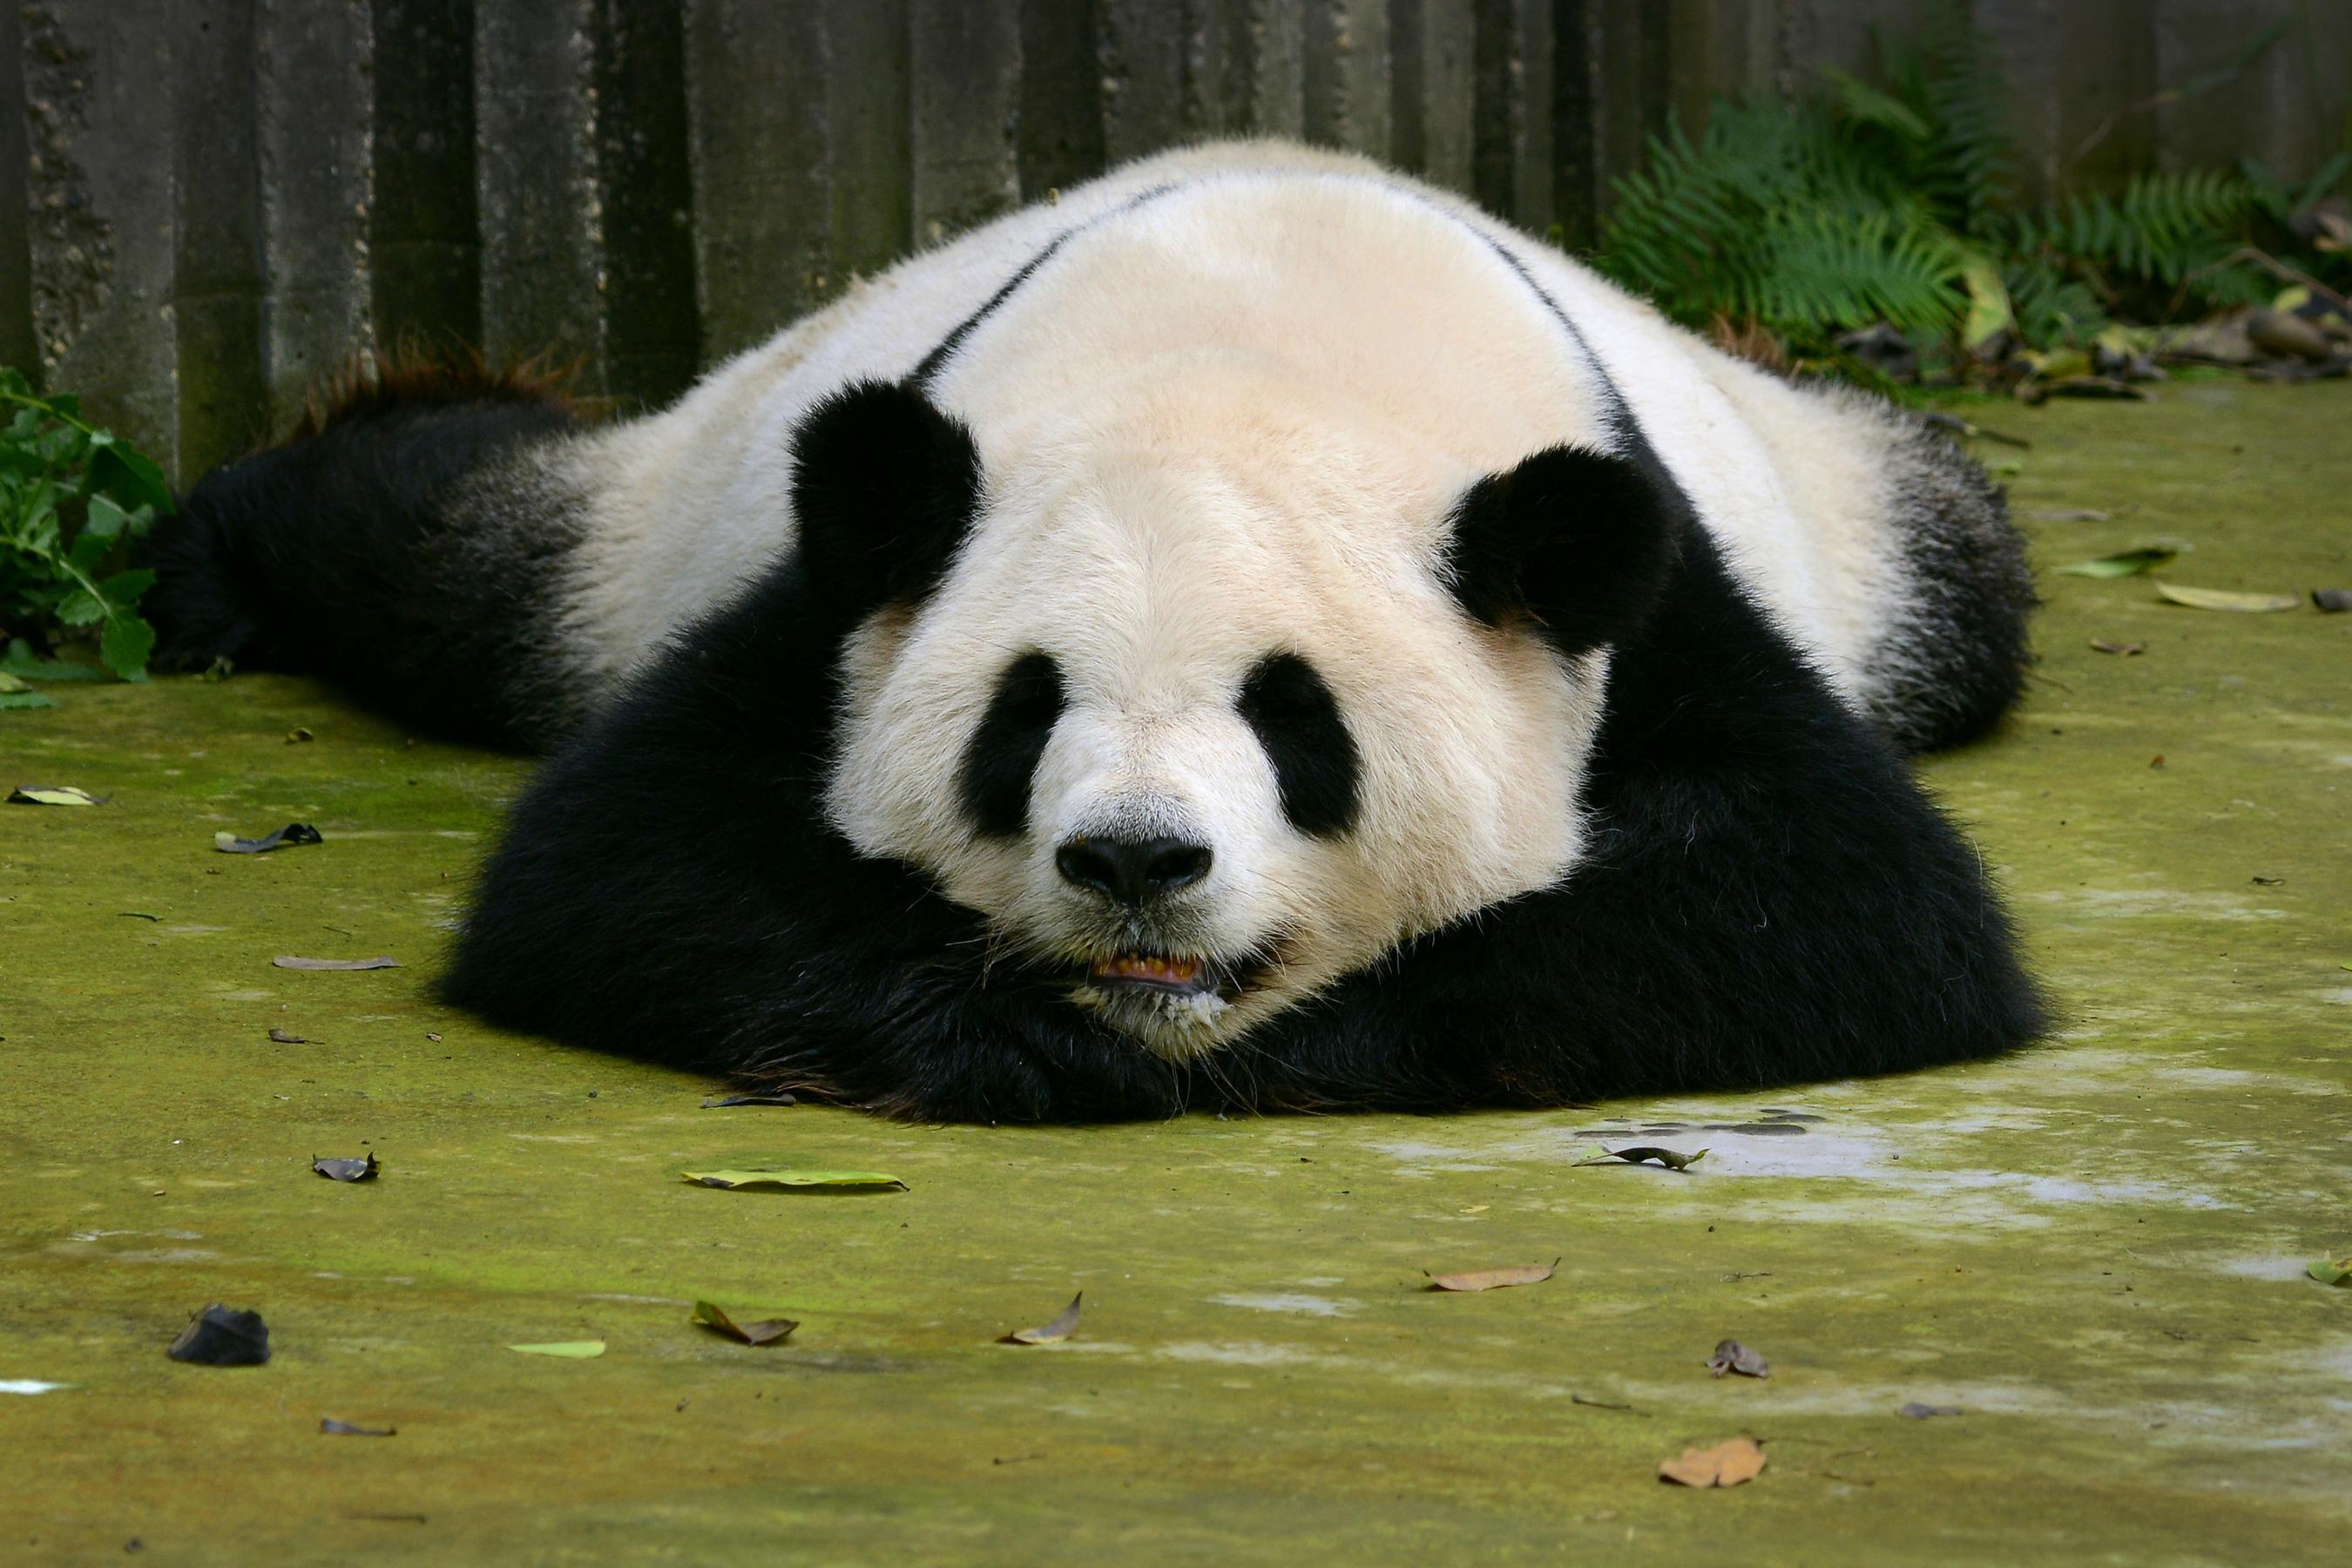 How to Visit Pandas in Chengdu, China